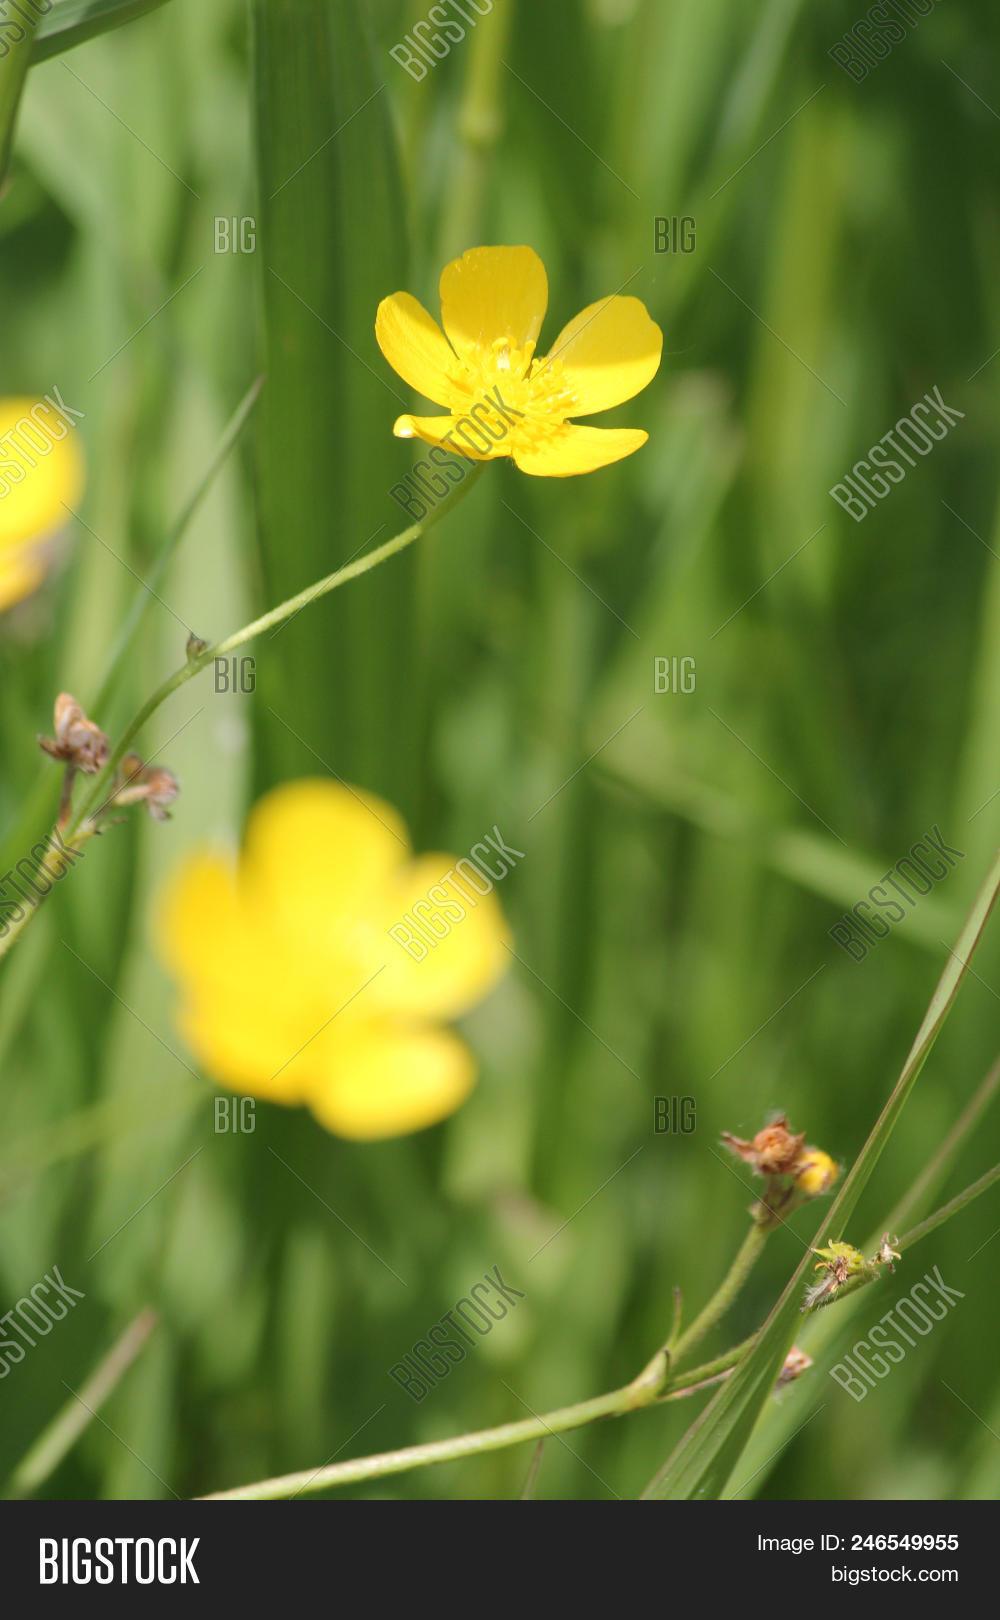 Waxy Bright Yellow Image Photo Free Trial Bigstock